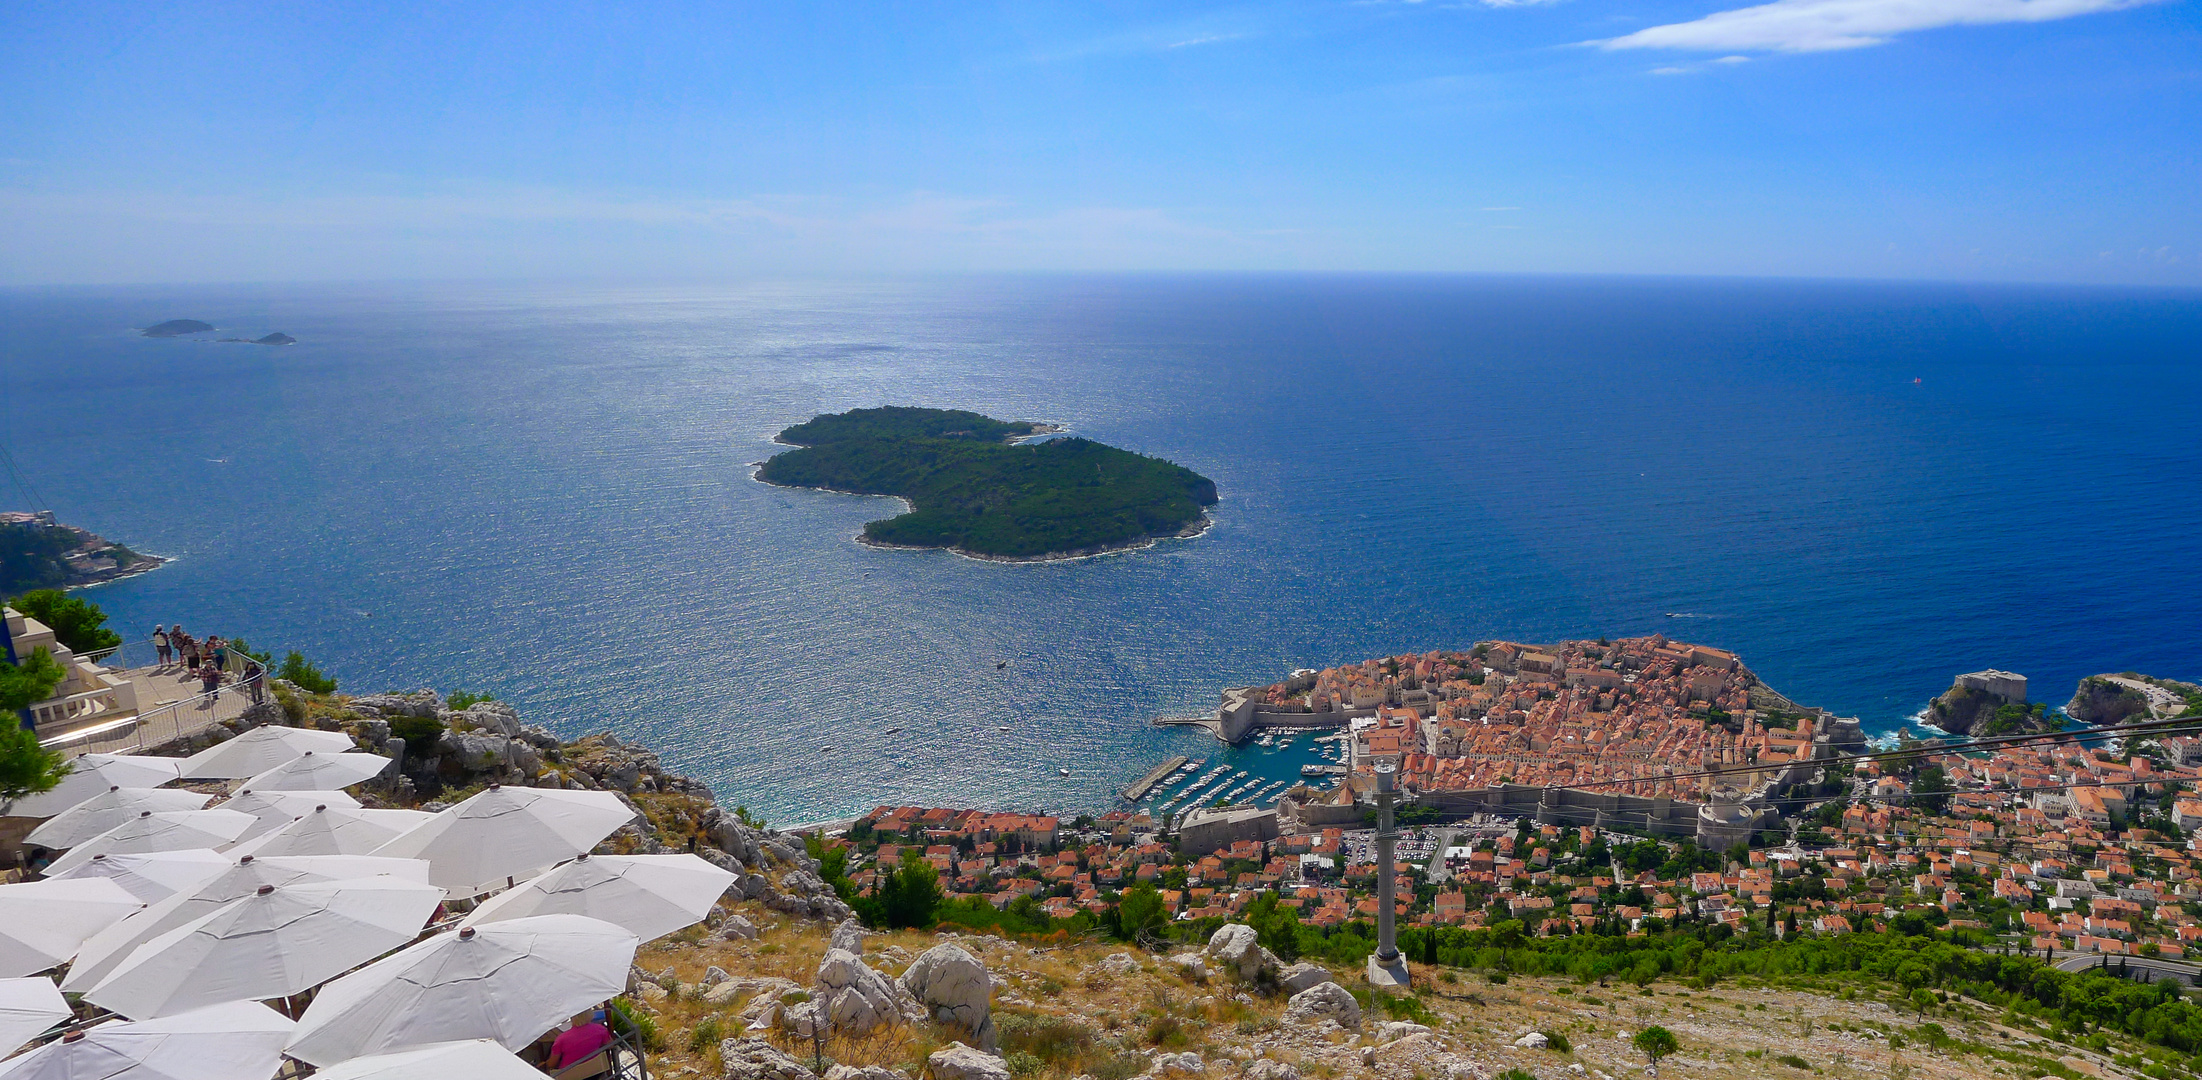 Postkartenidylle über Dubrovnik